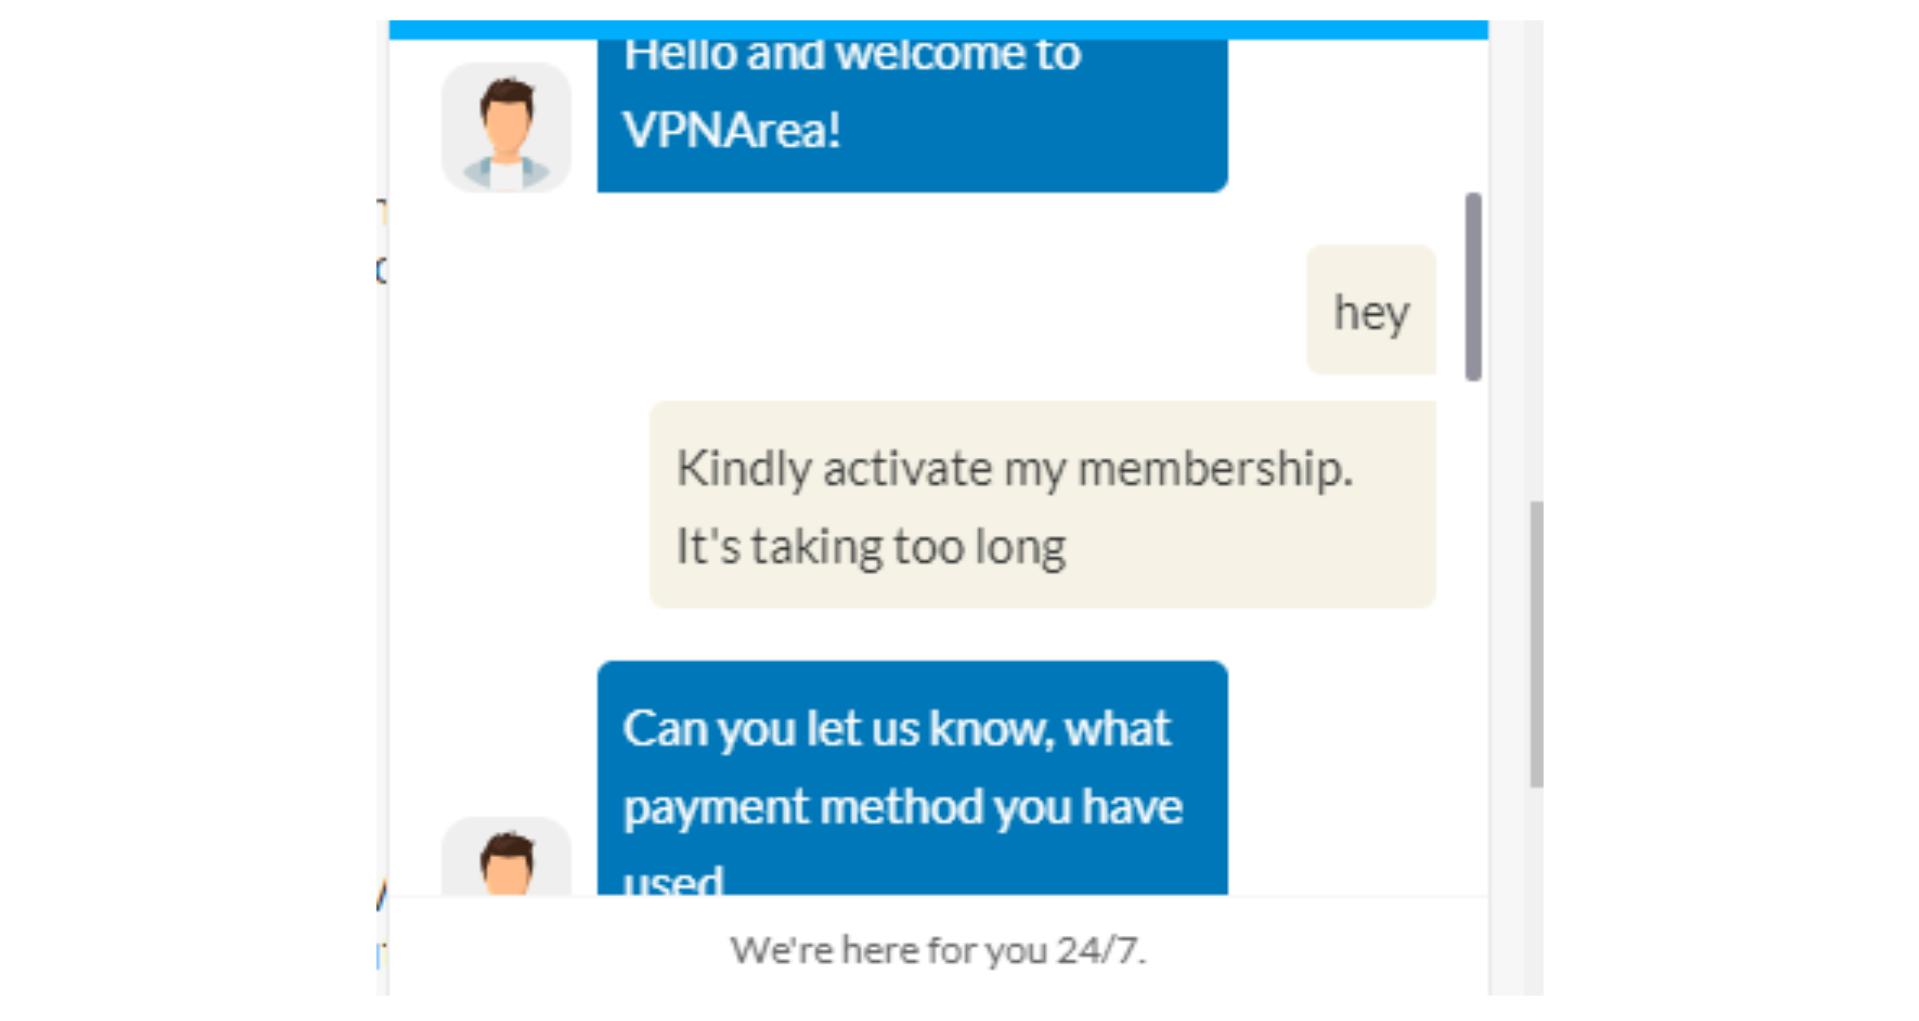 A screenshot of VPNArea's customer service response